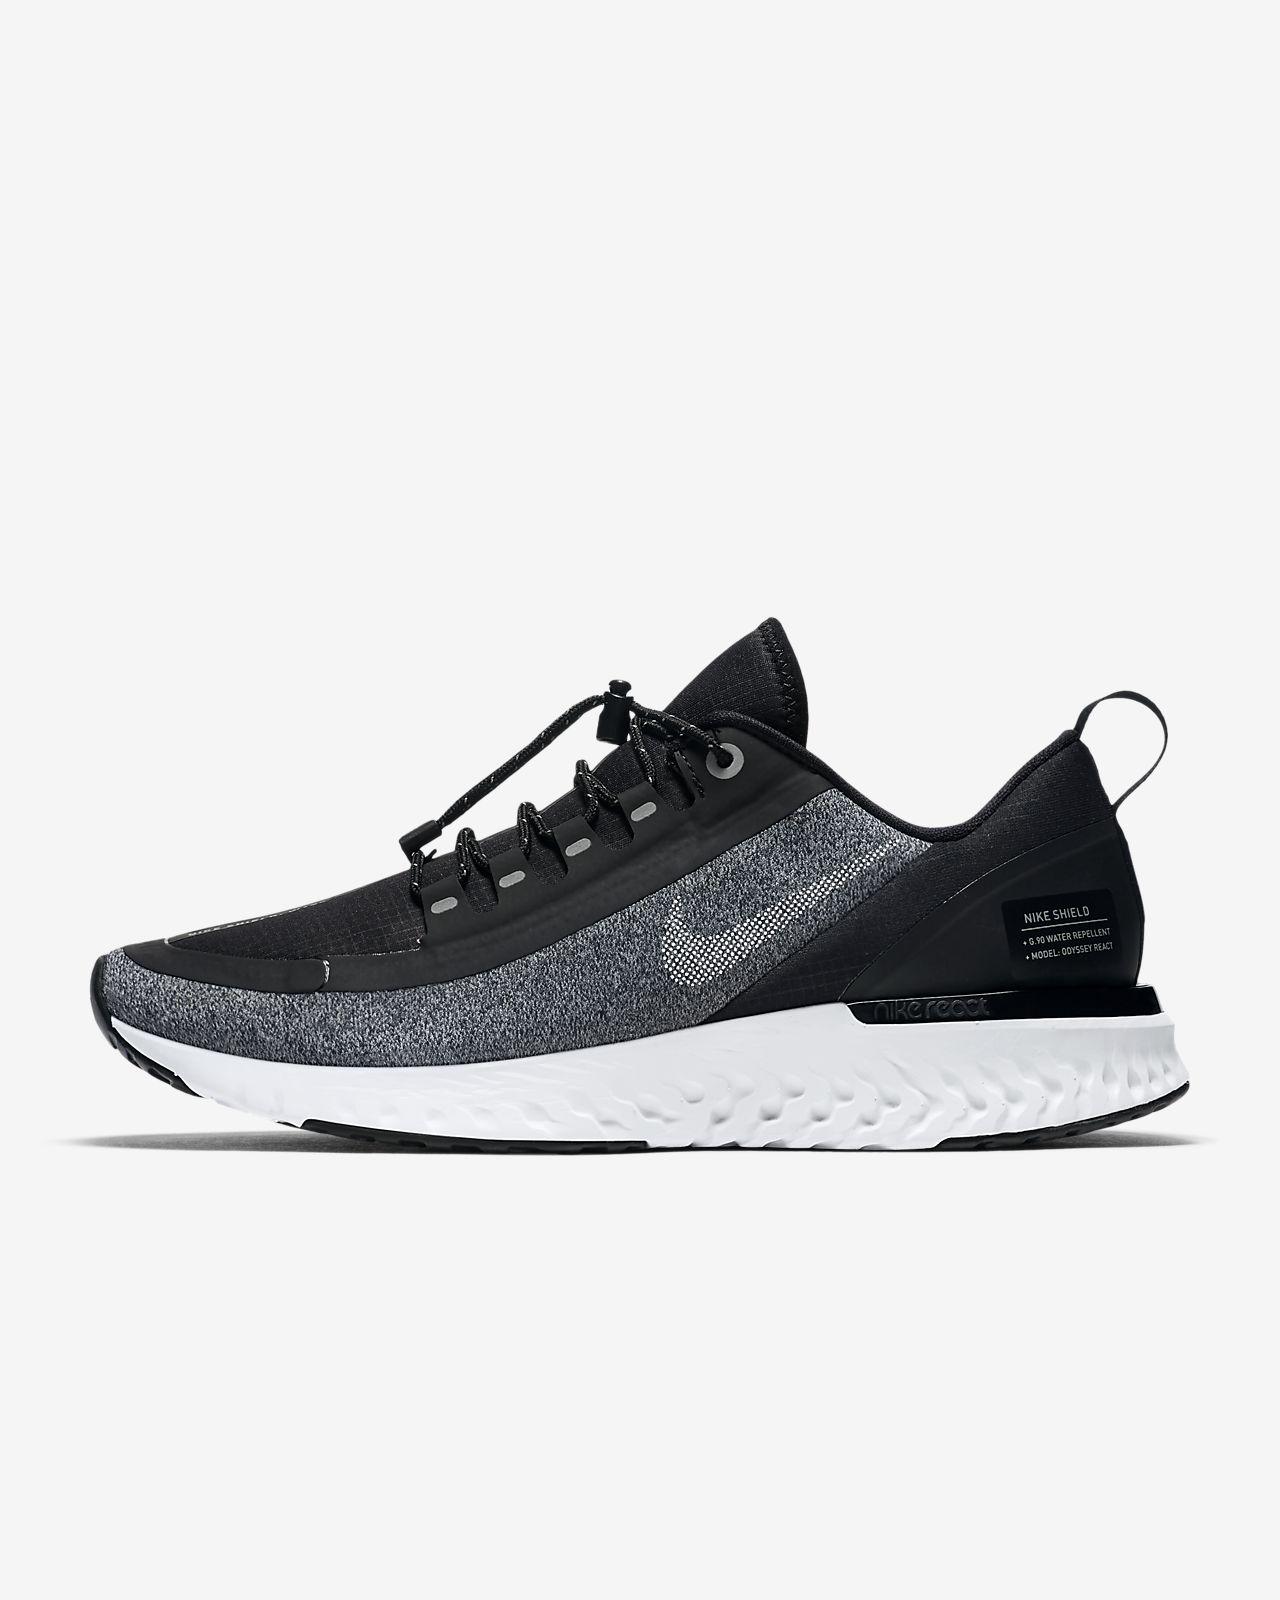 Sapatilhas de running Nike Odyssey React Shield Water-Repellent para mulher